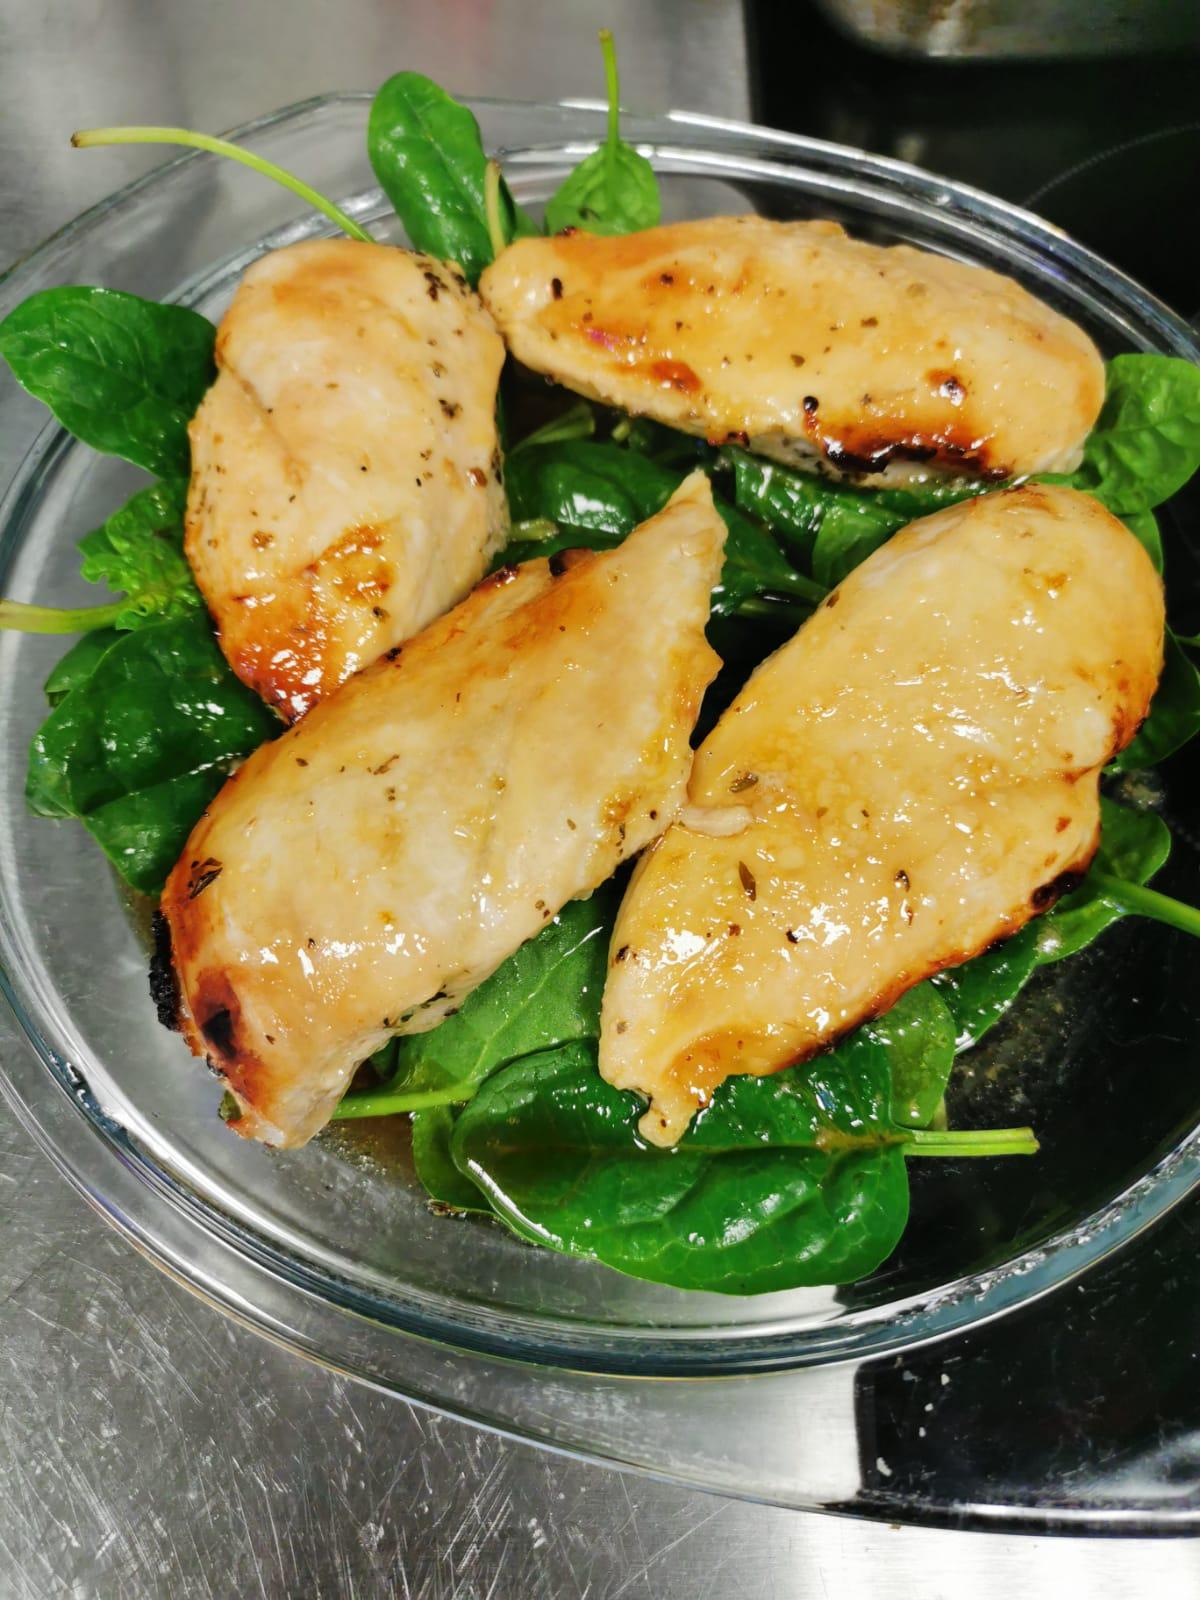 Baked Honey Glazed Chicken